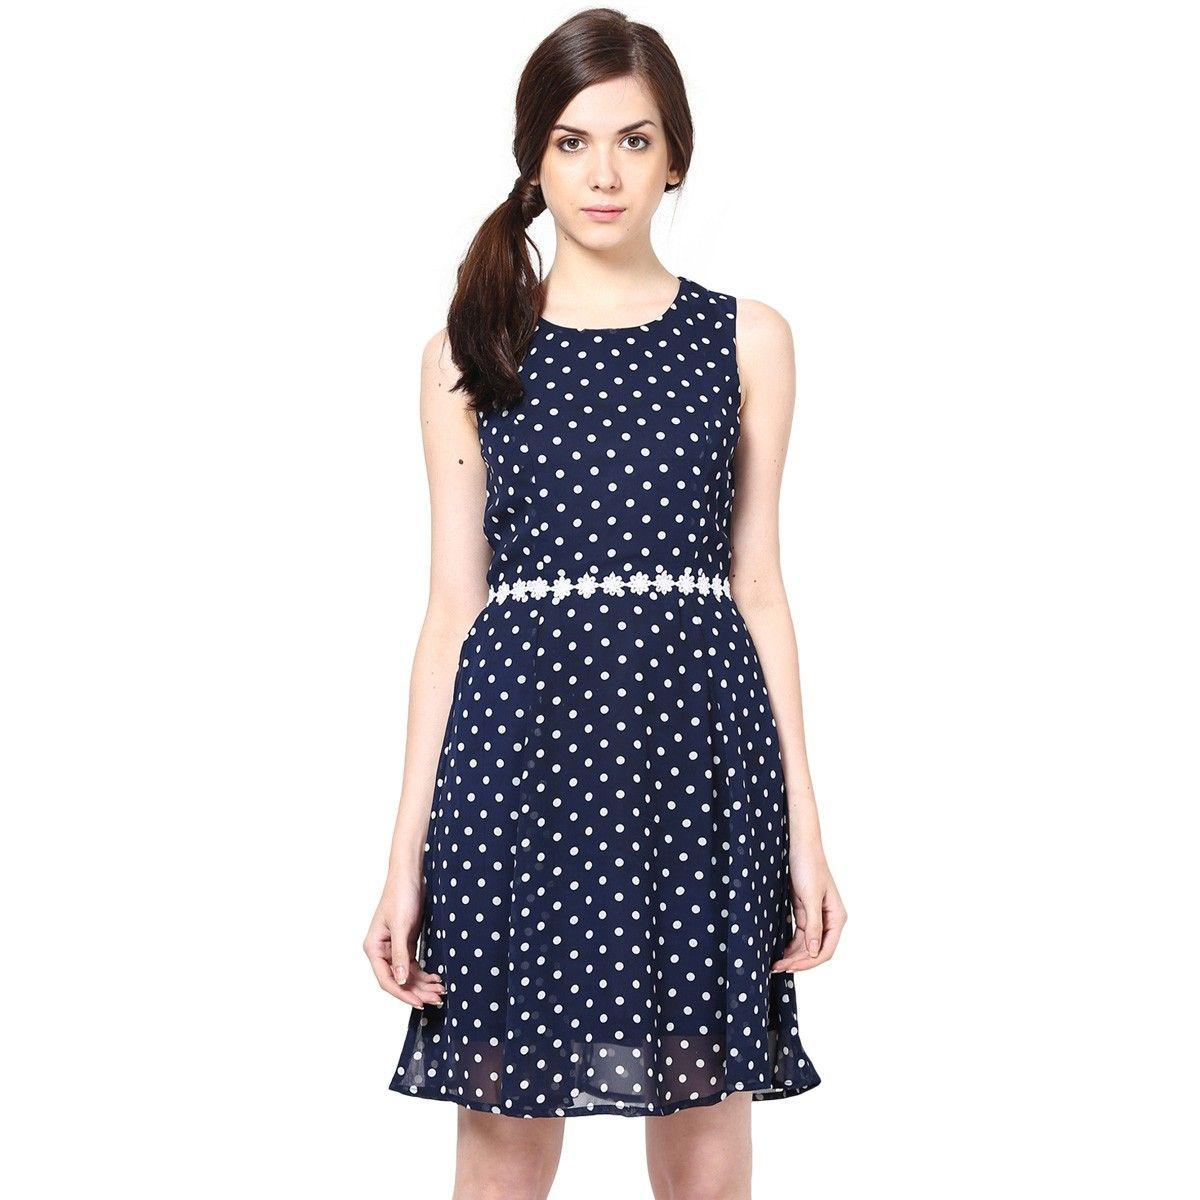 383e12b6a4c74 Georgette Navy Blue 401446 Polka Dot Print Skater Dress